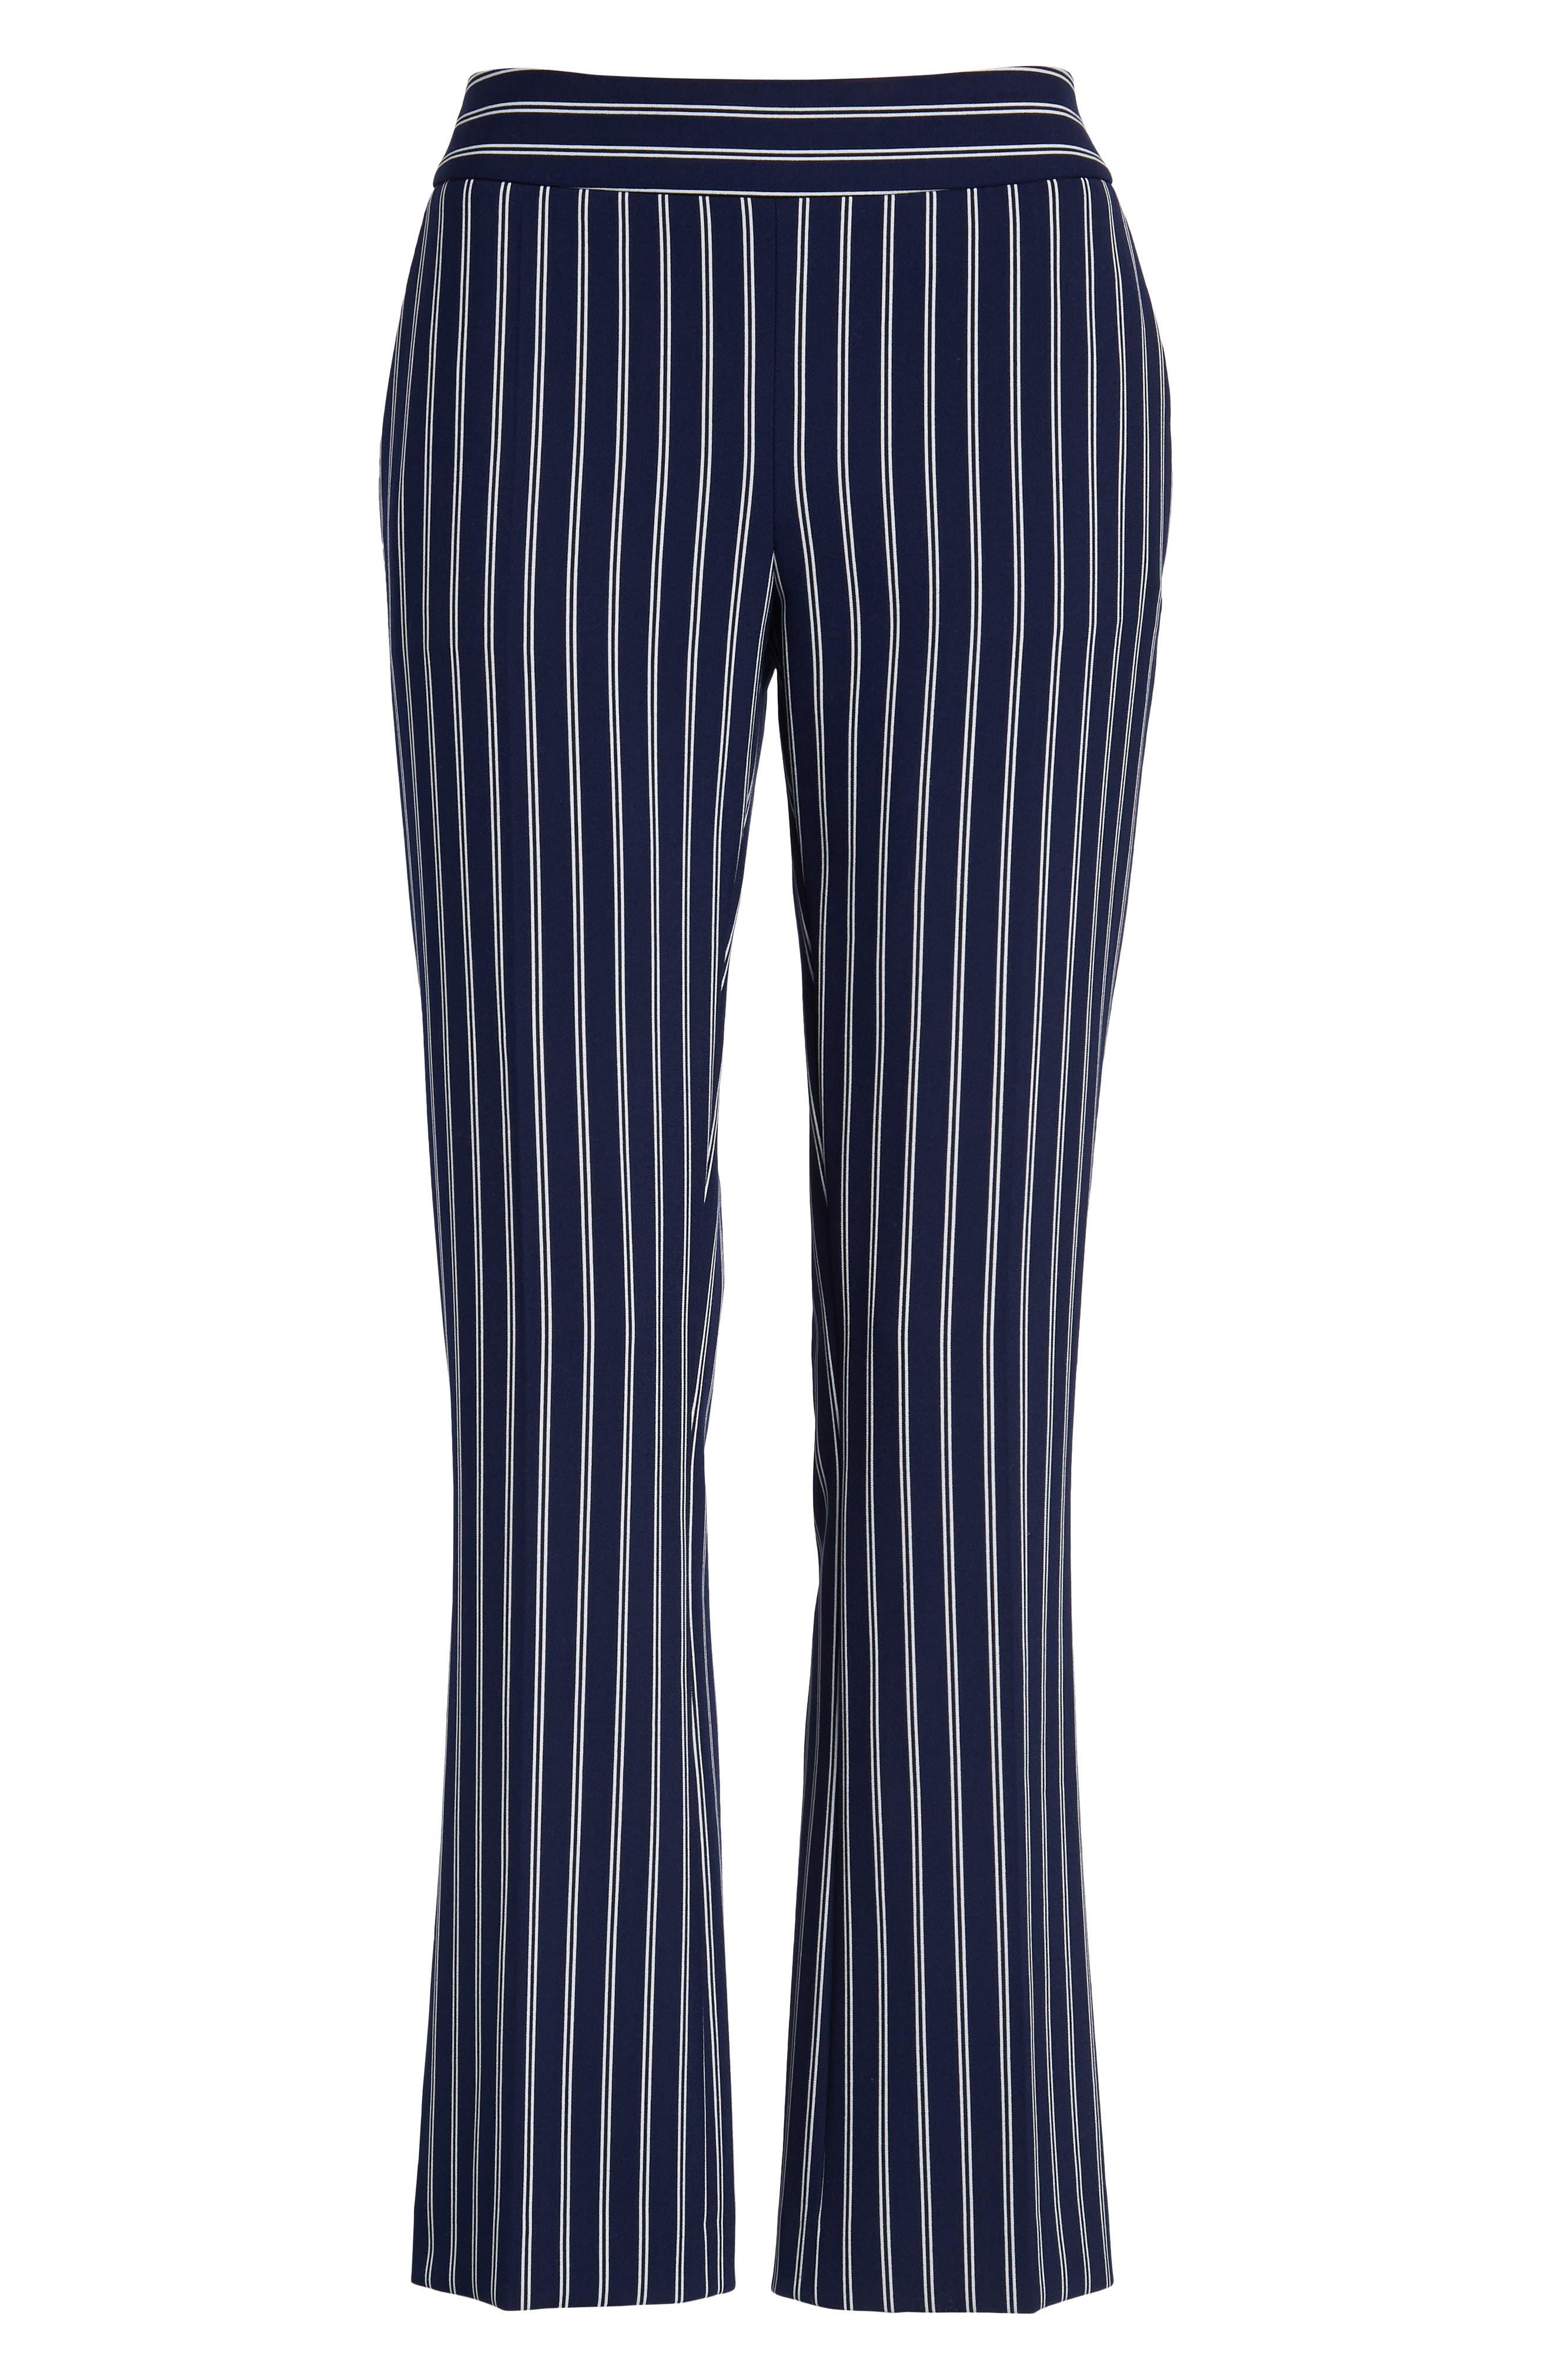 Tebella Stripe Pants,                             Alternate thumbnail 7, color,